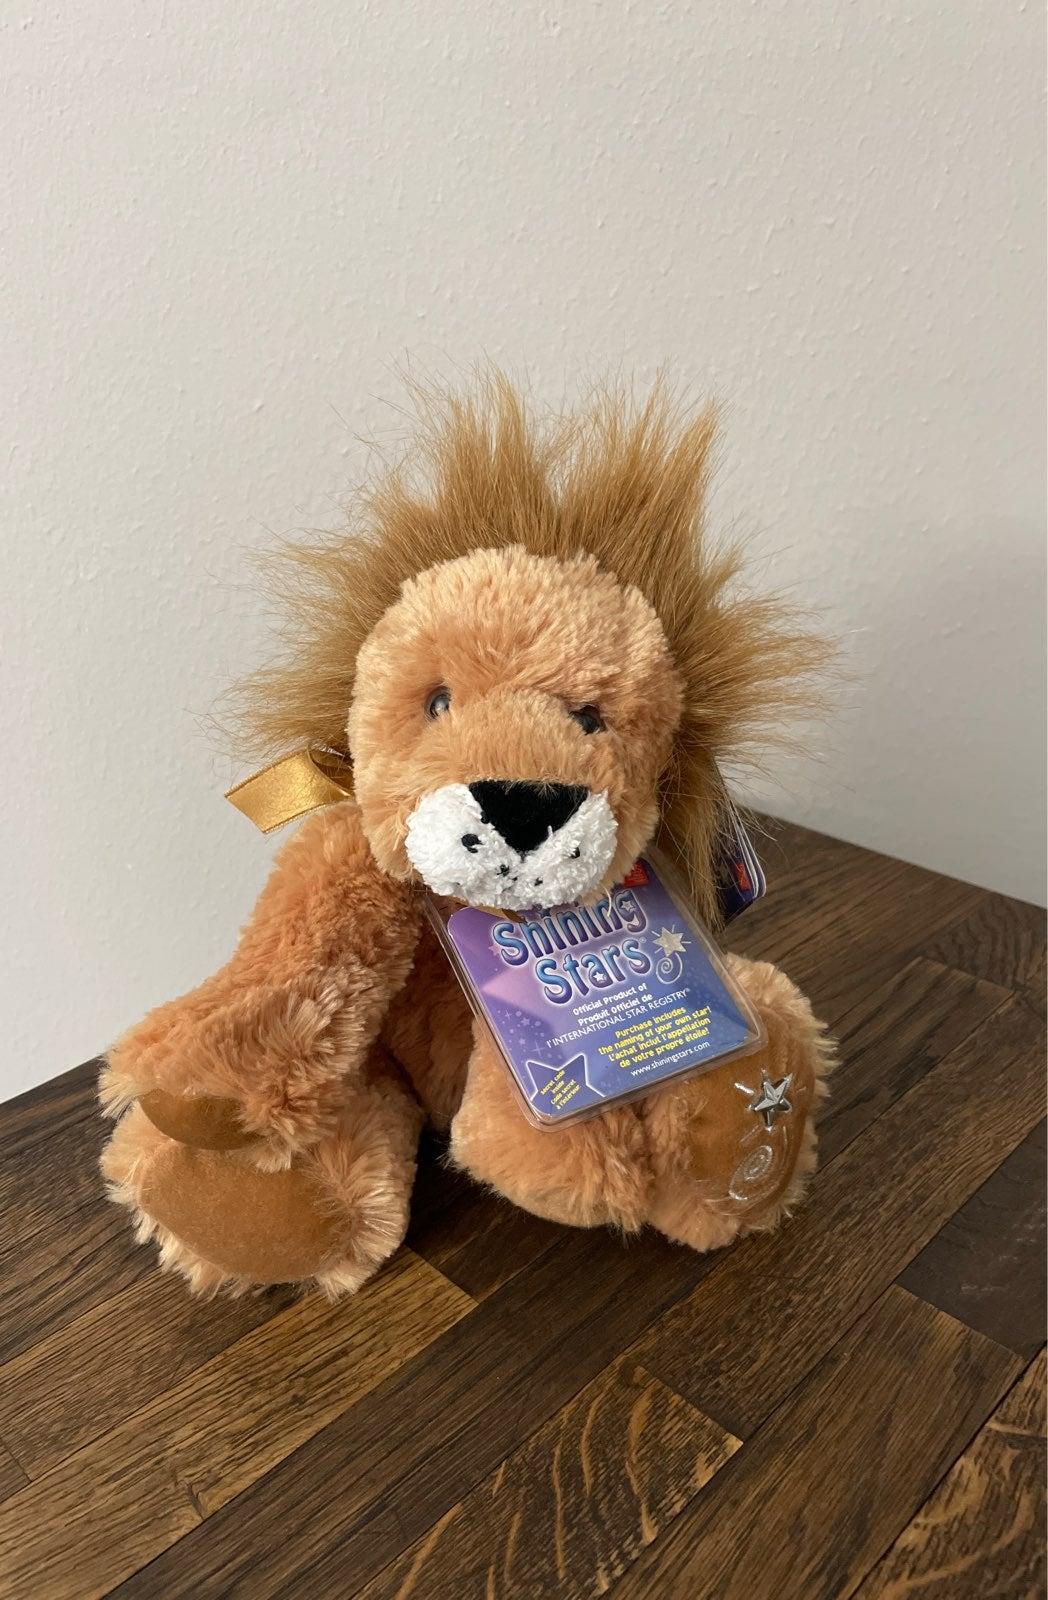 Shining Stars Lion plush